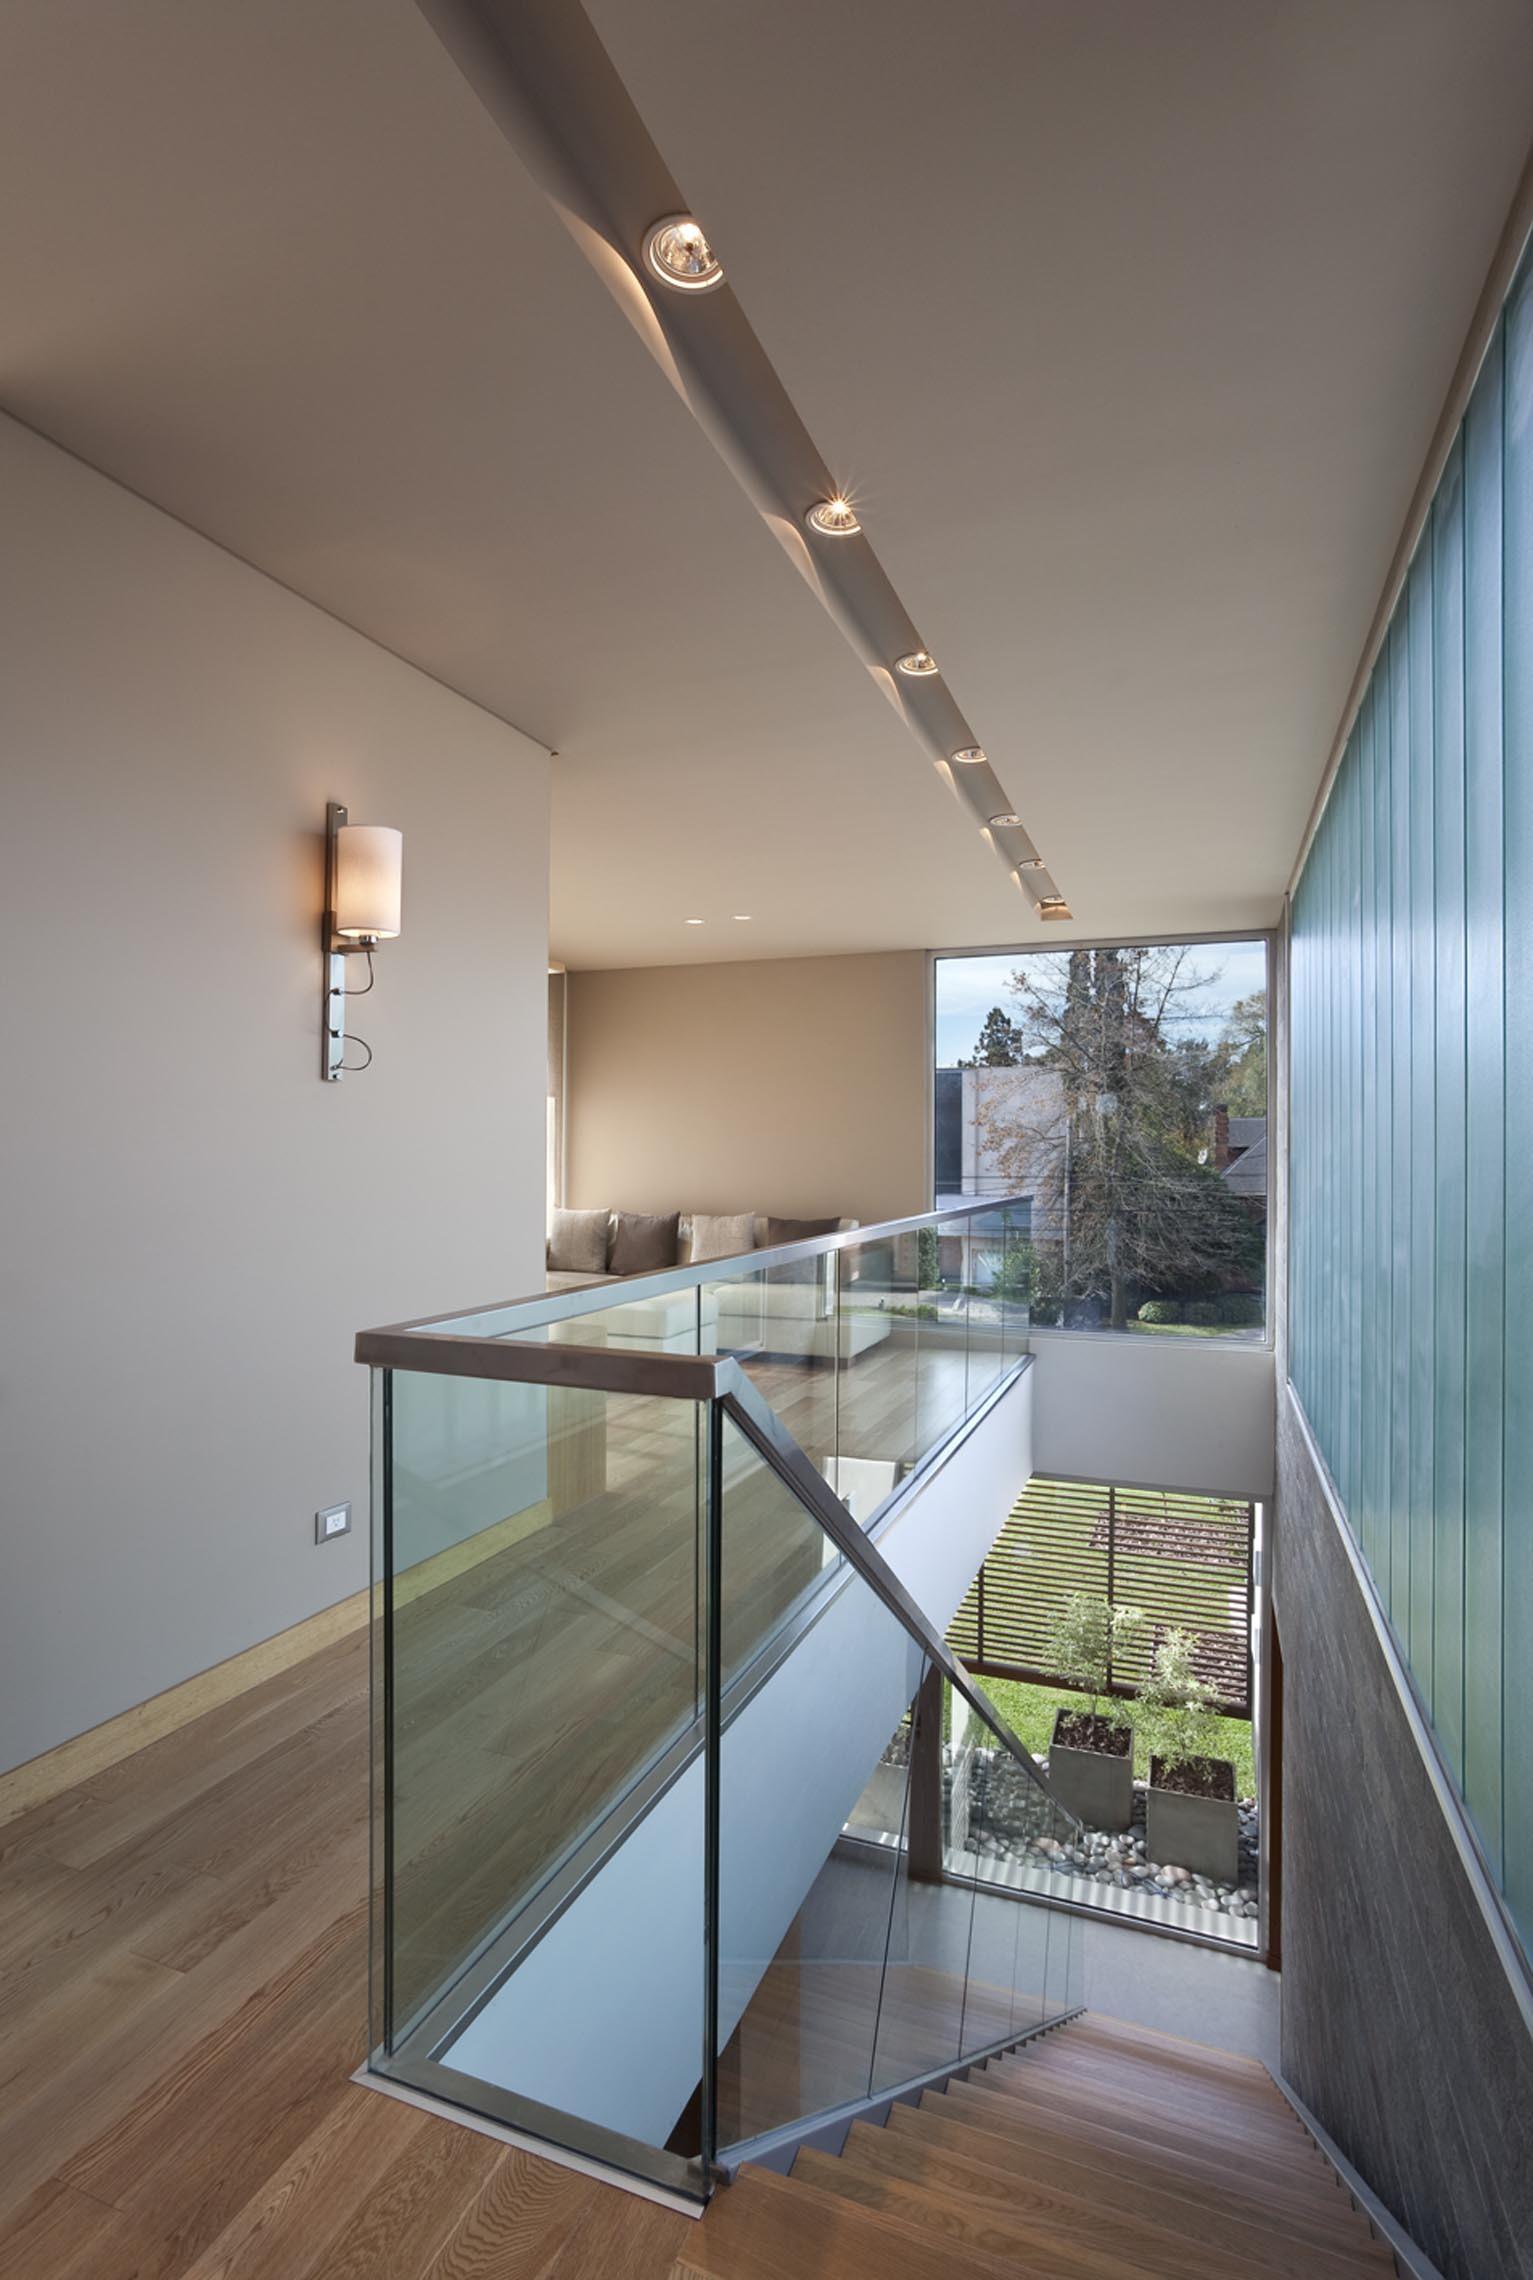 Galer a de casa en pilar estudio parysow schargrodsky - Estudio 3 arquitectos ...